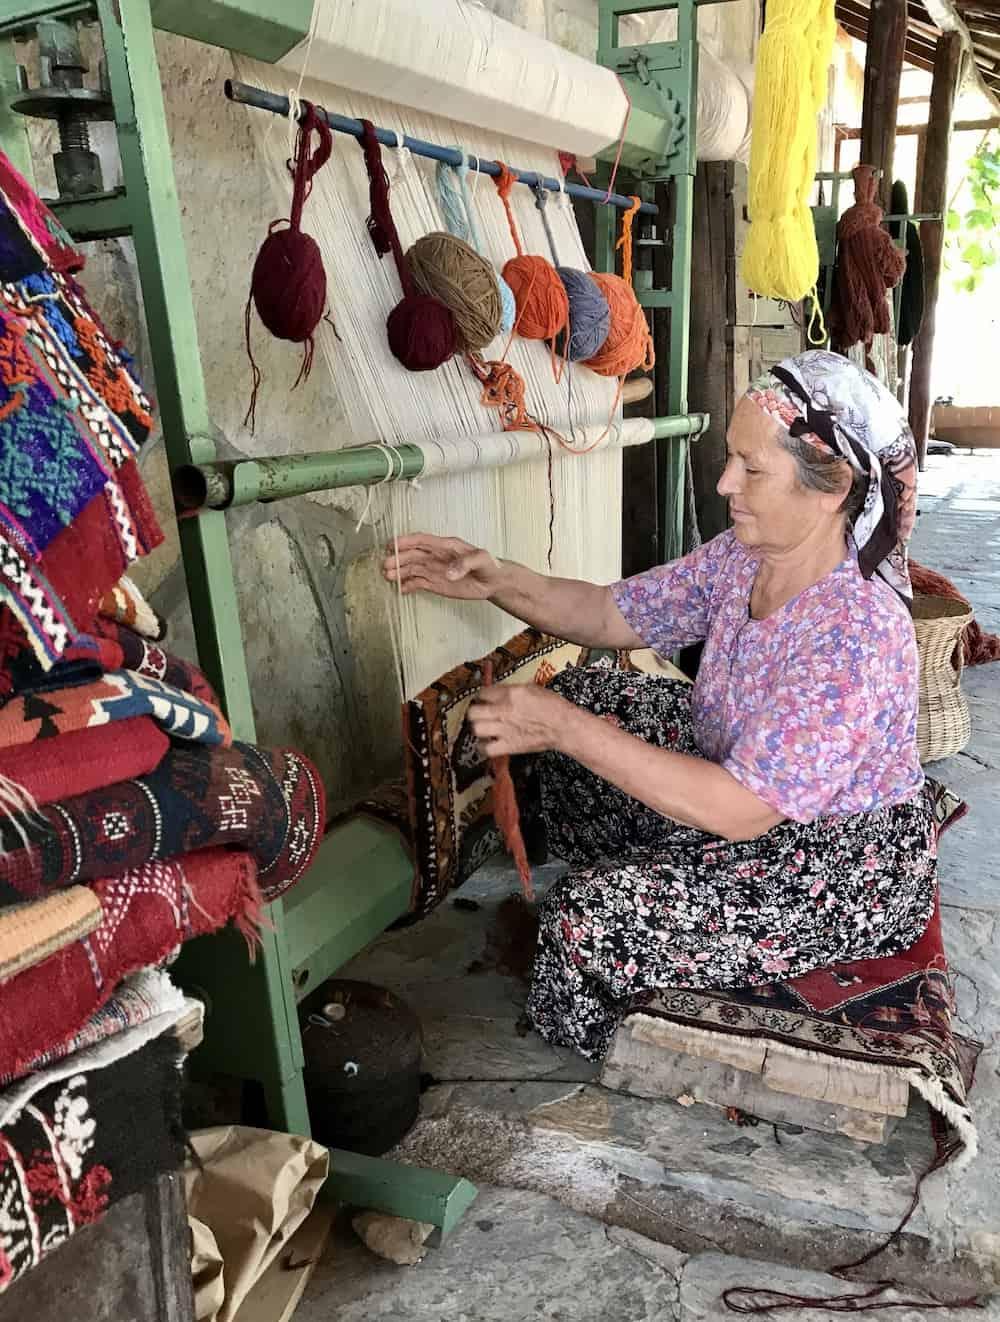 Woman demonstrating weaving at Etrim Hali Carpet Cooperative.